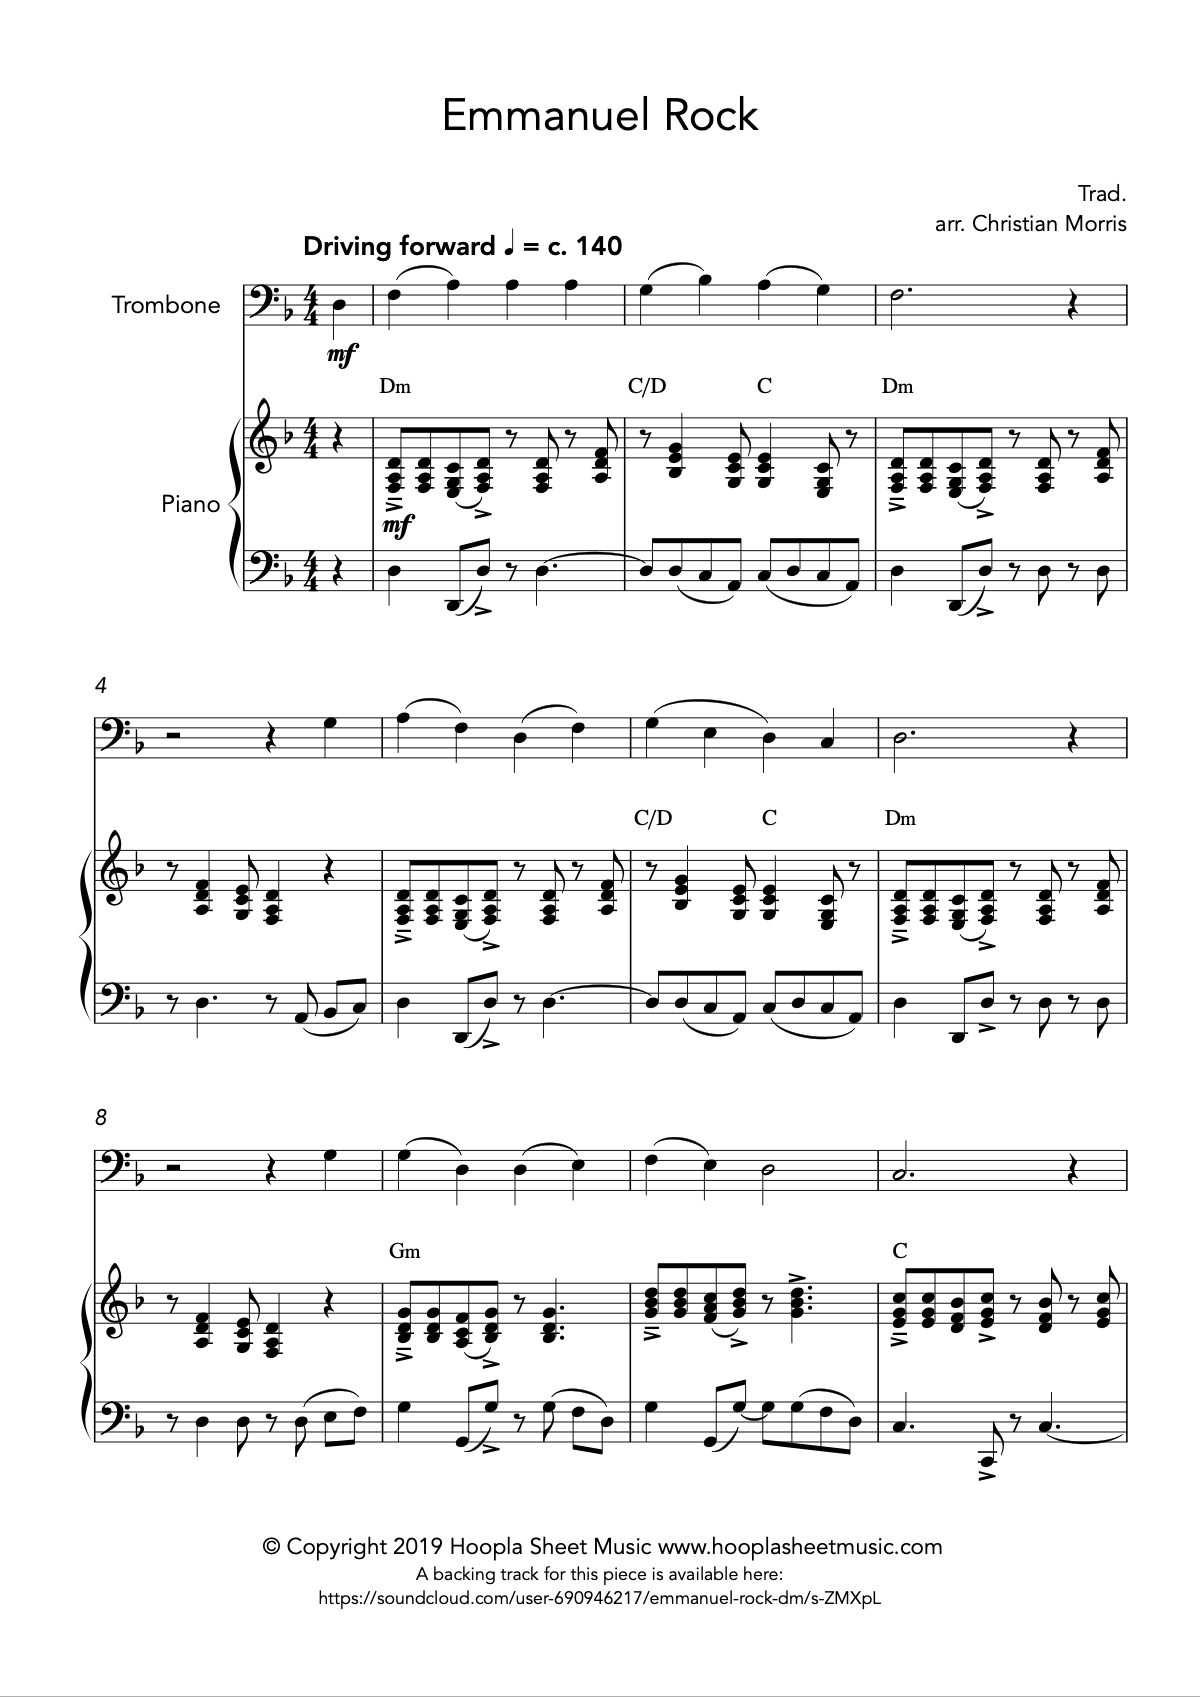 Emmanuel Rock (O Come, O Come Emmanuel) for Trombone